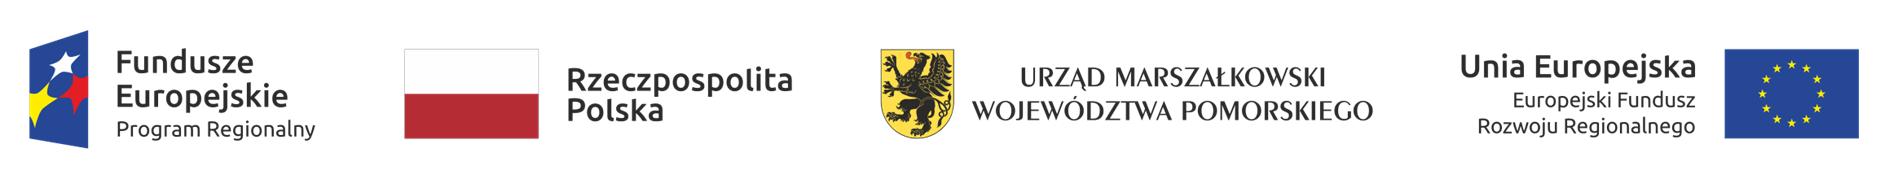 logo UE [1889x179]